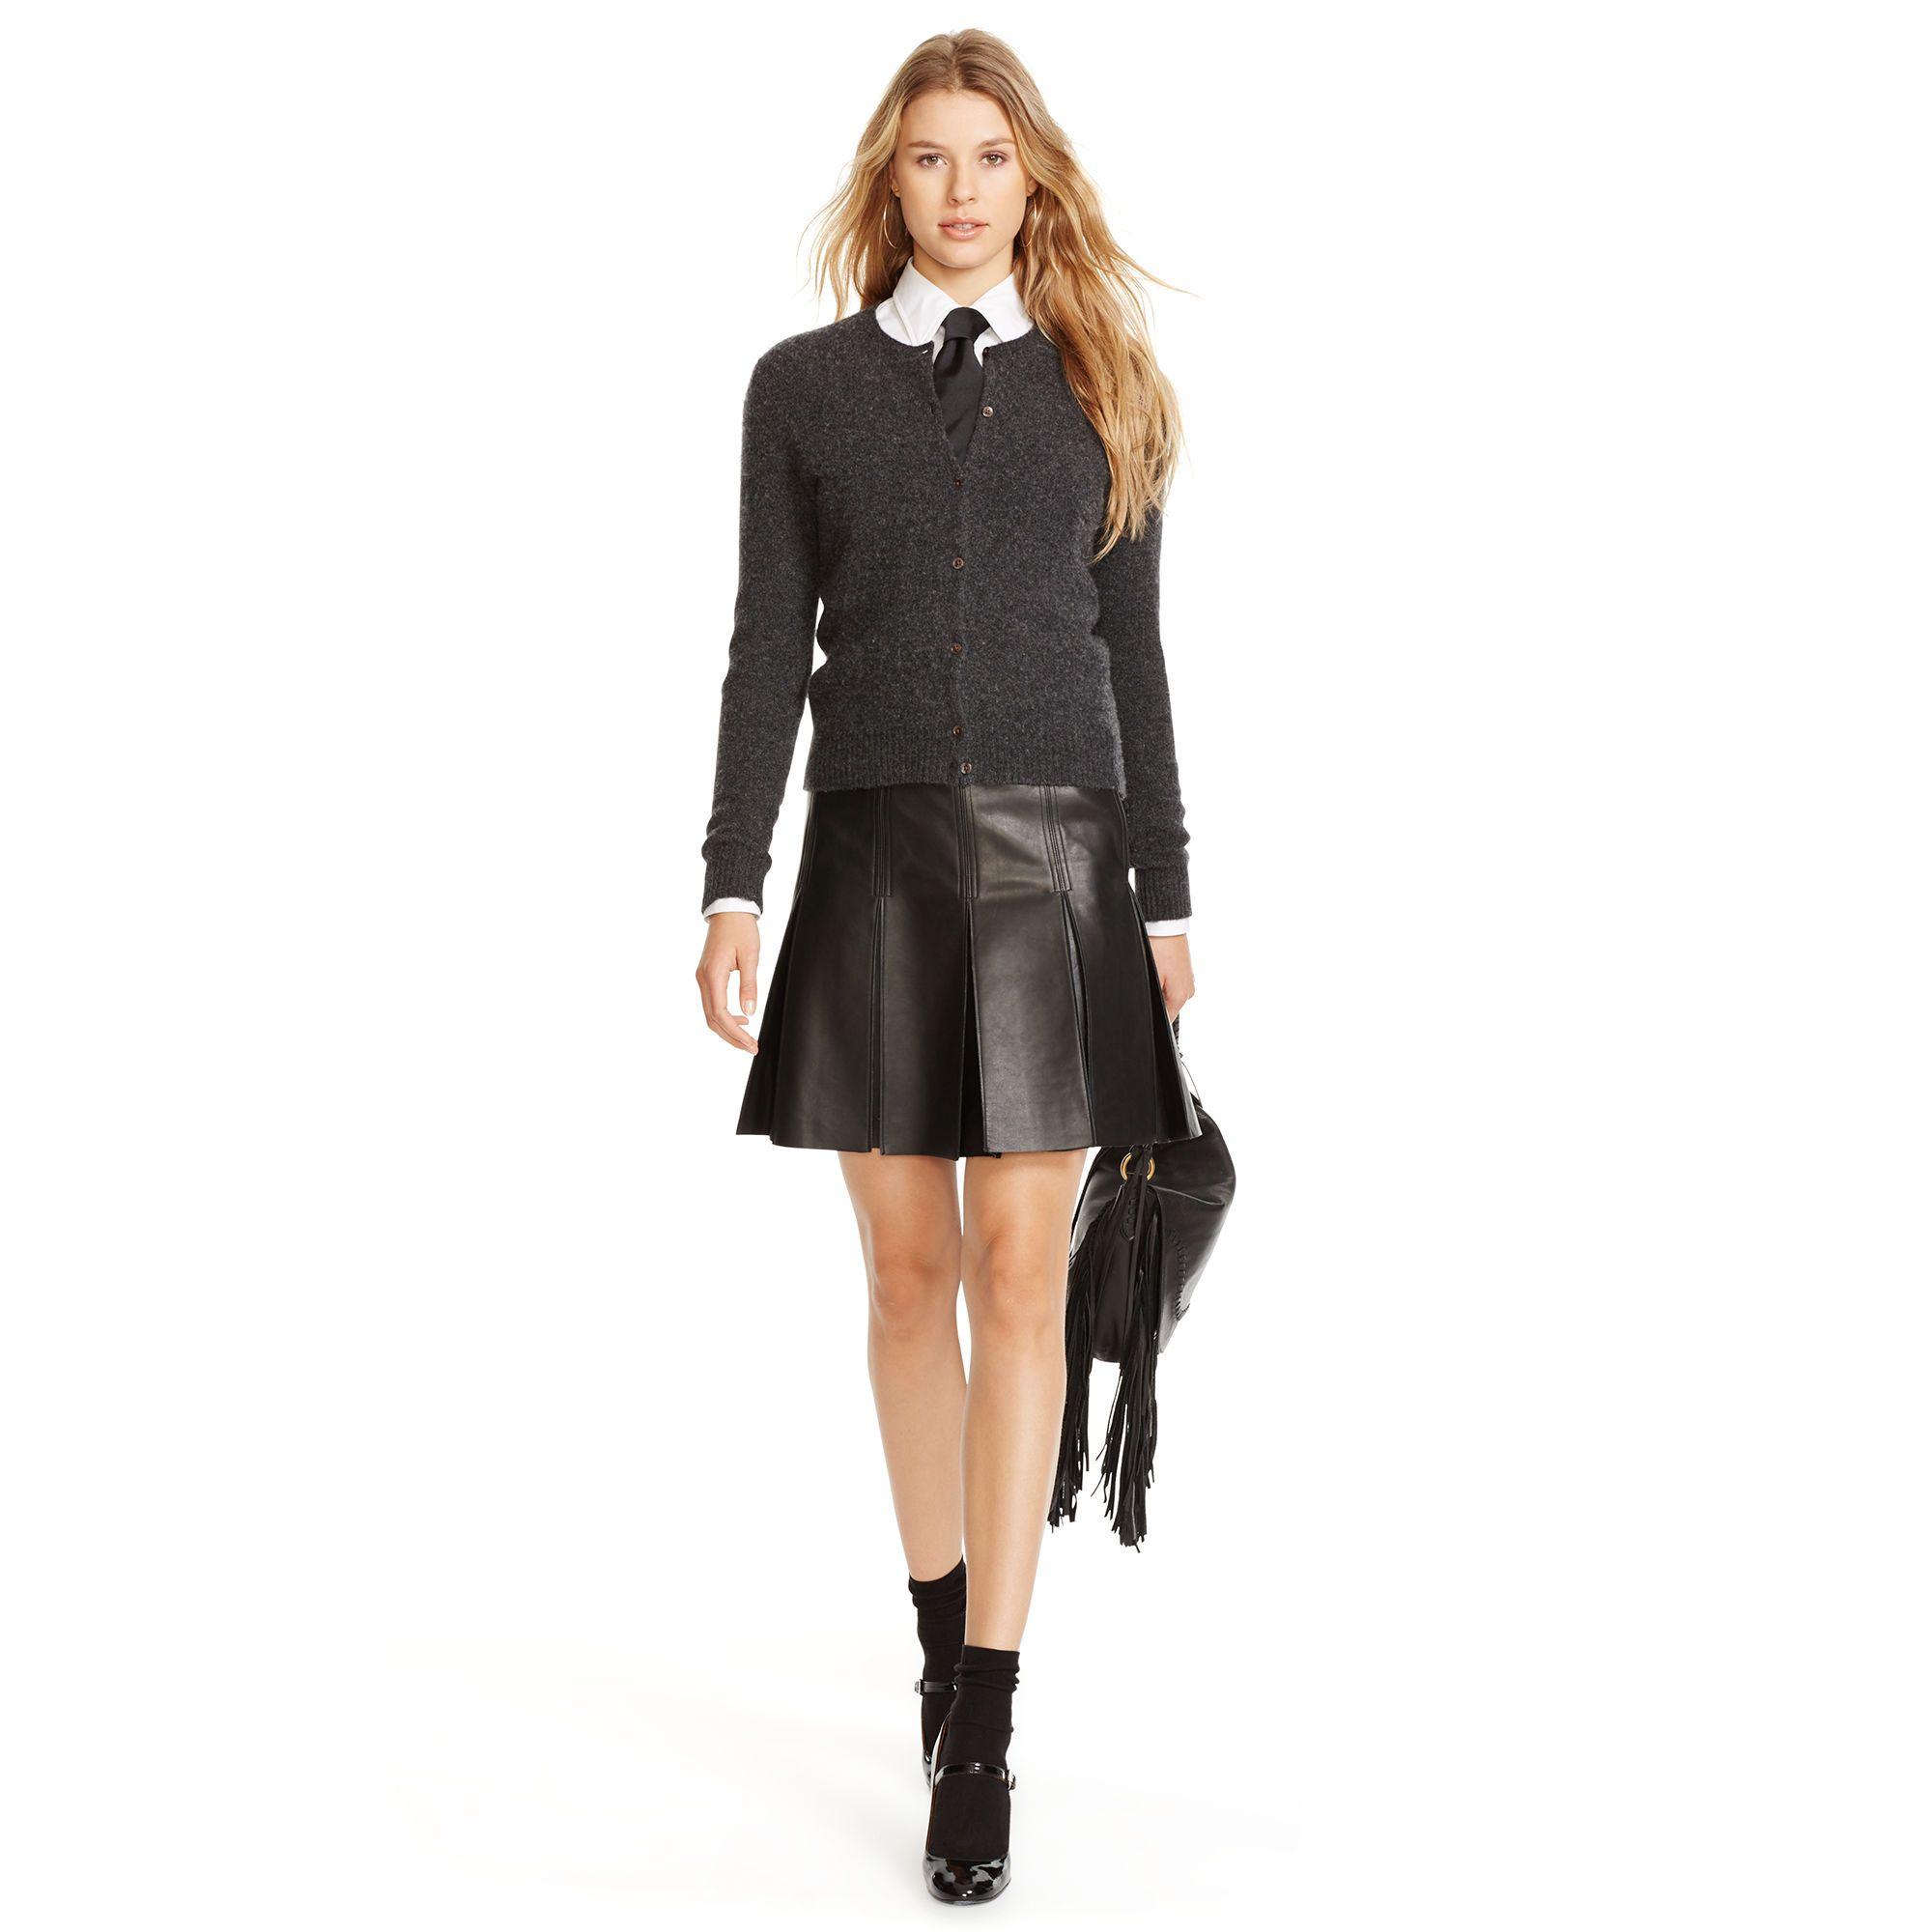 lederrock mit falten r cke skorts damen ralph lauren deutschland trends leather skirts. Black Bedroom Furniture Sets. Home Design Ideas